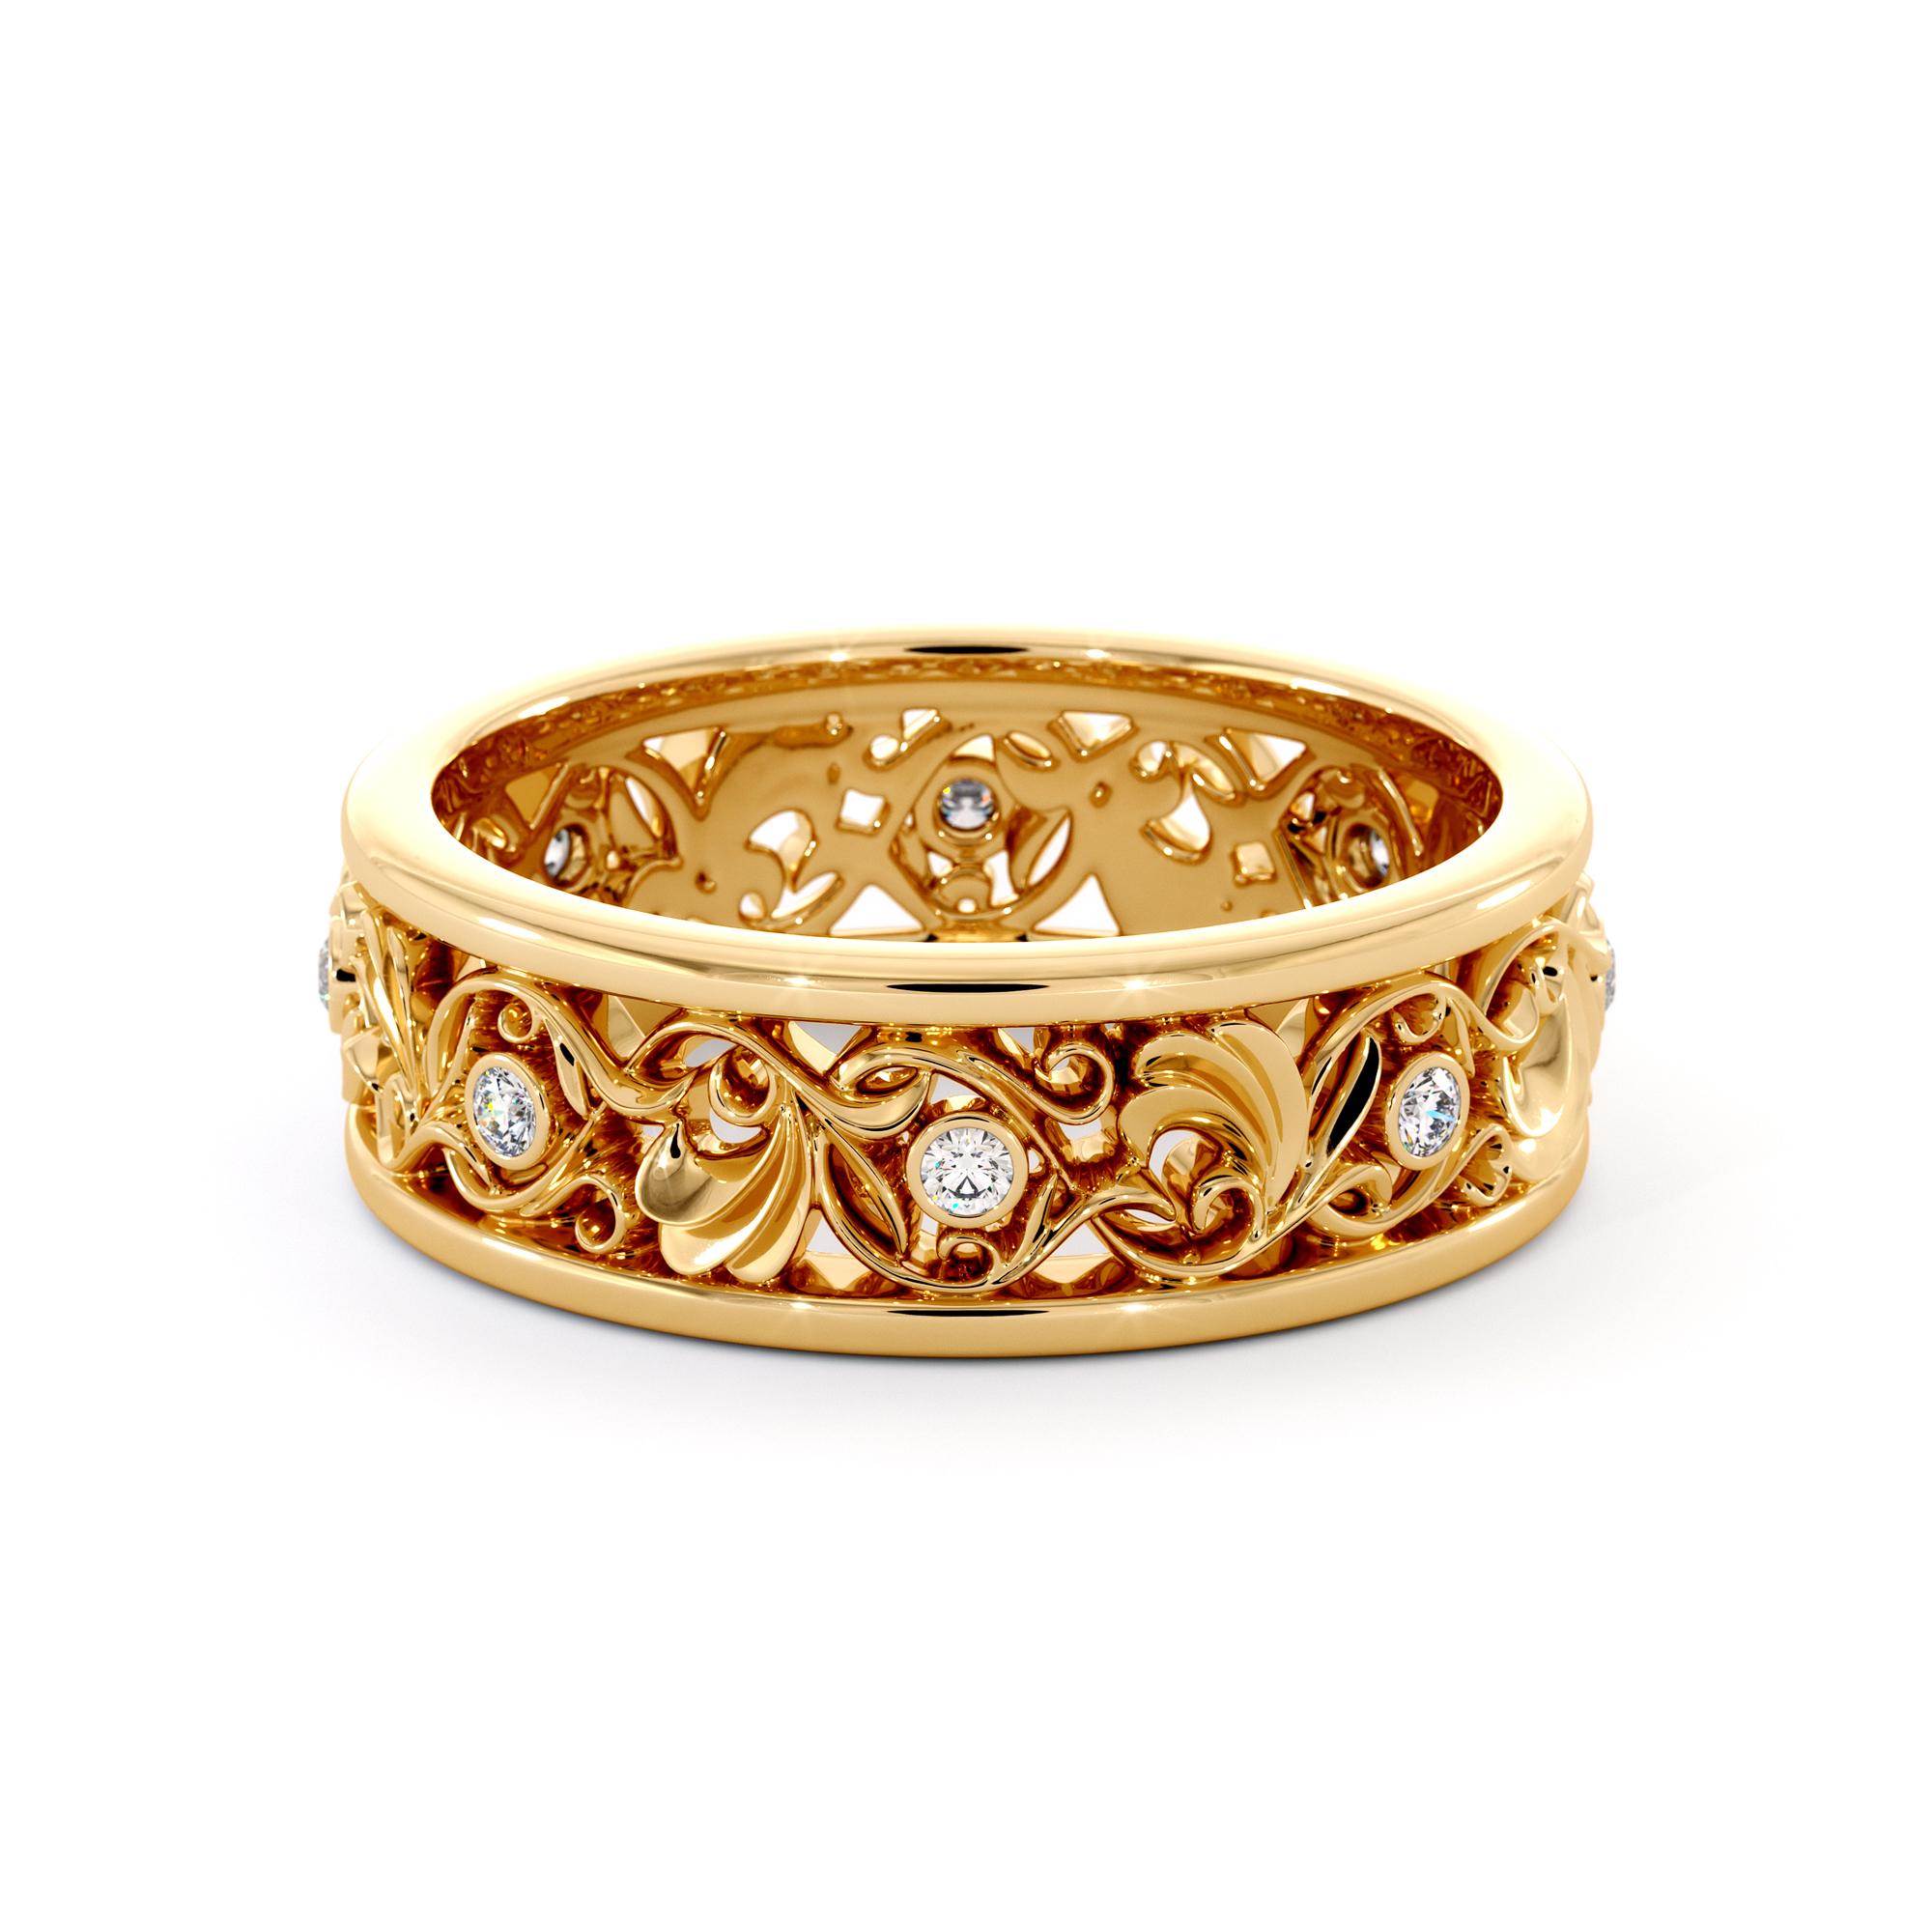 Vintage Diamonds Wedding Band Unique Woman's Wedding Ring 14K Gold Bridal Ring